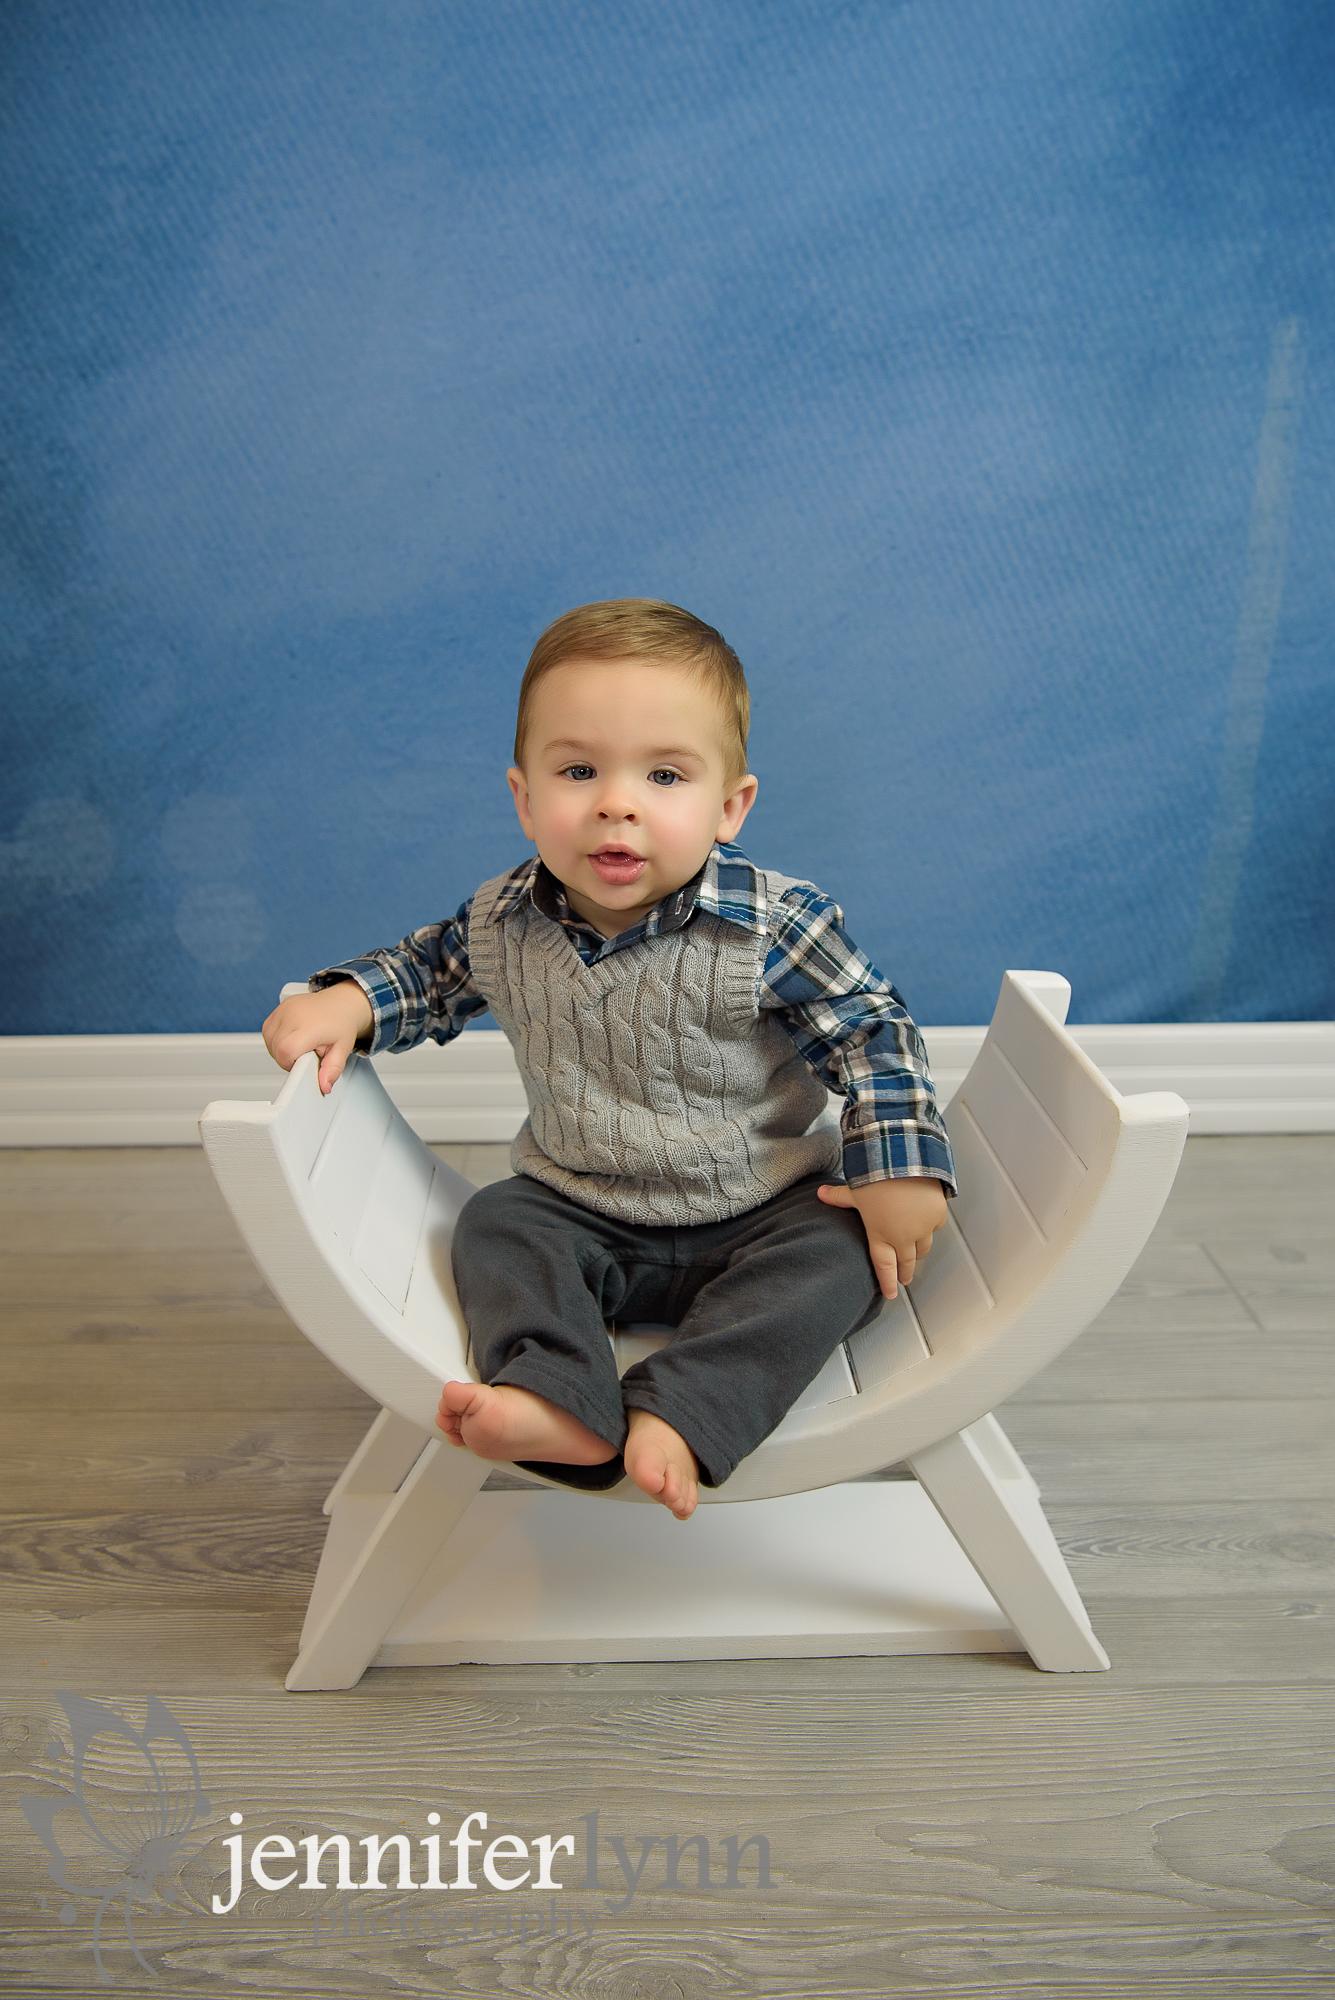 Baby Boy Sitting U Bench